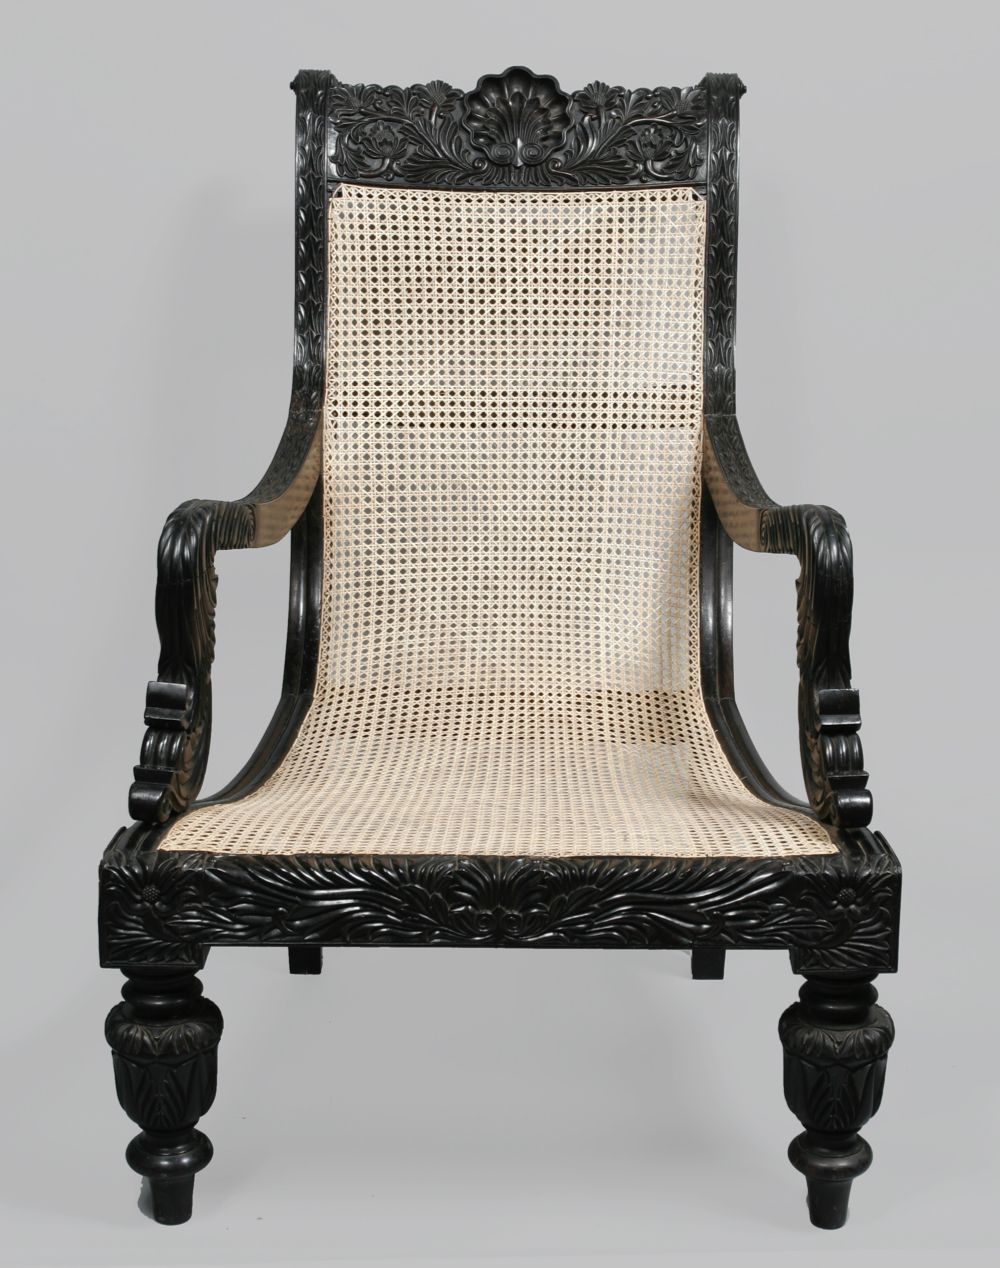 Ebony easy chair, Sri Lanka, Galle, mid 19th century from